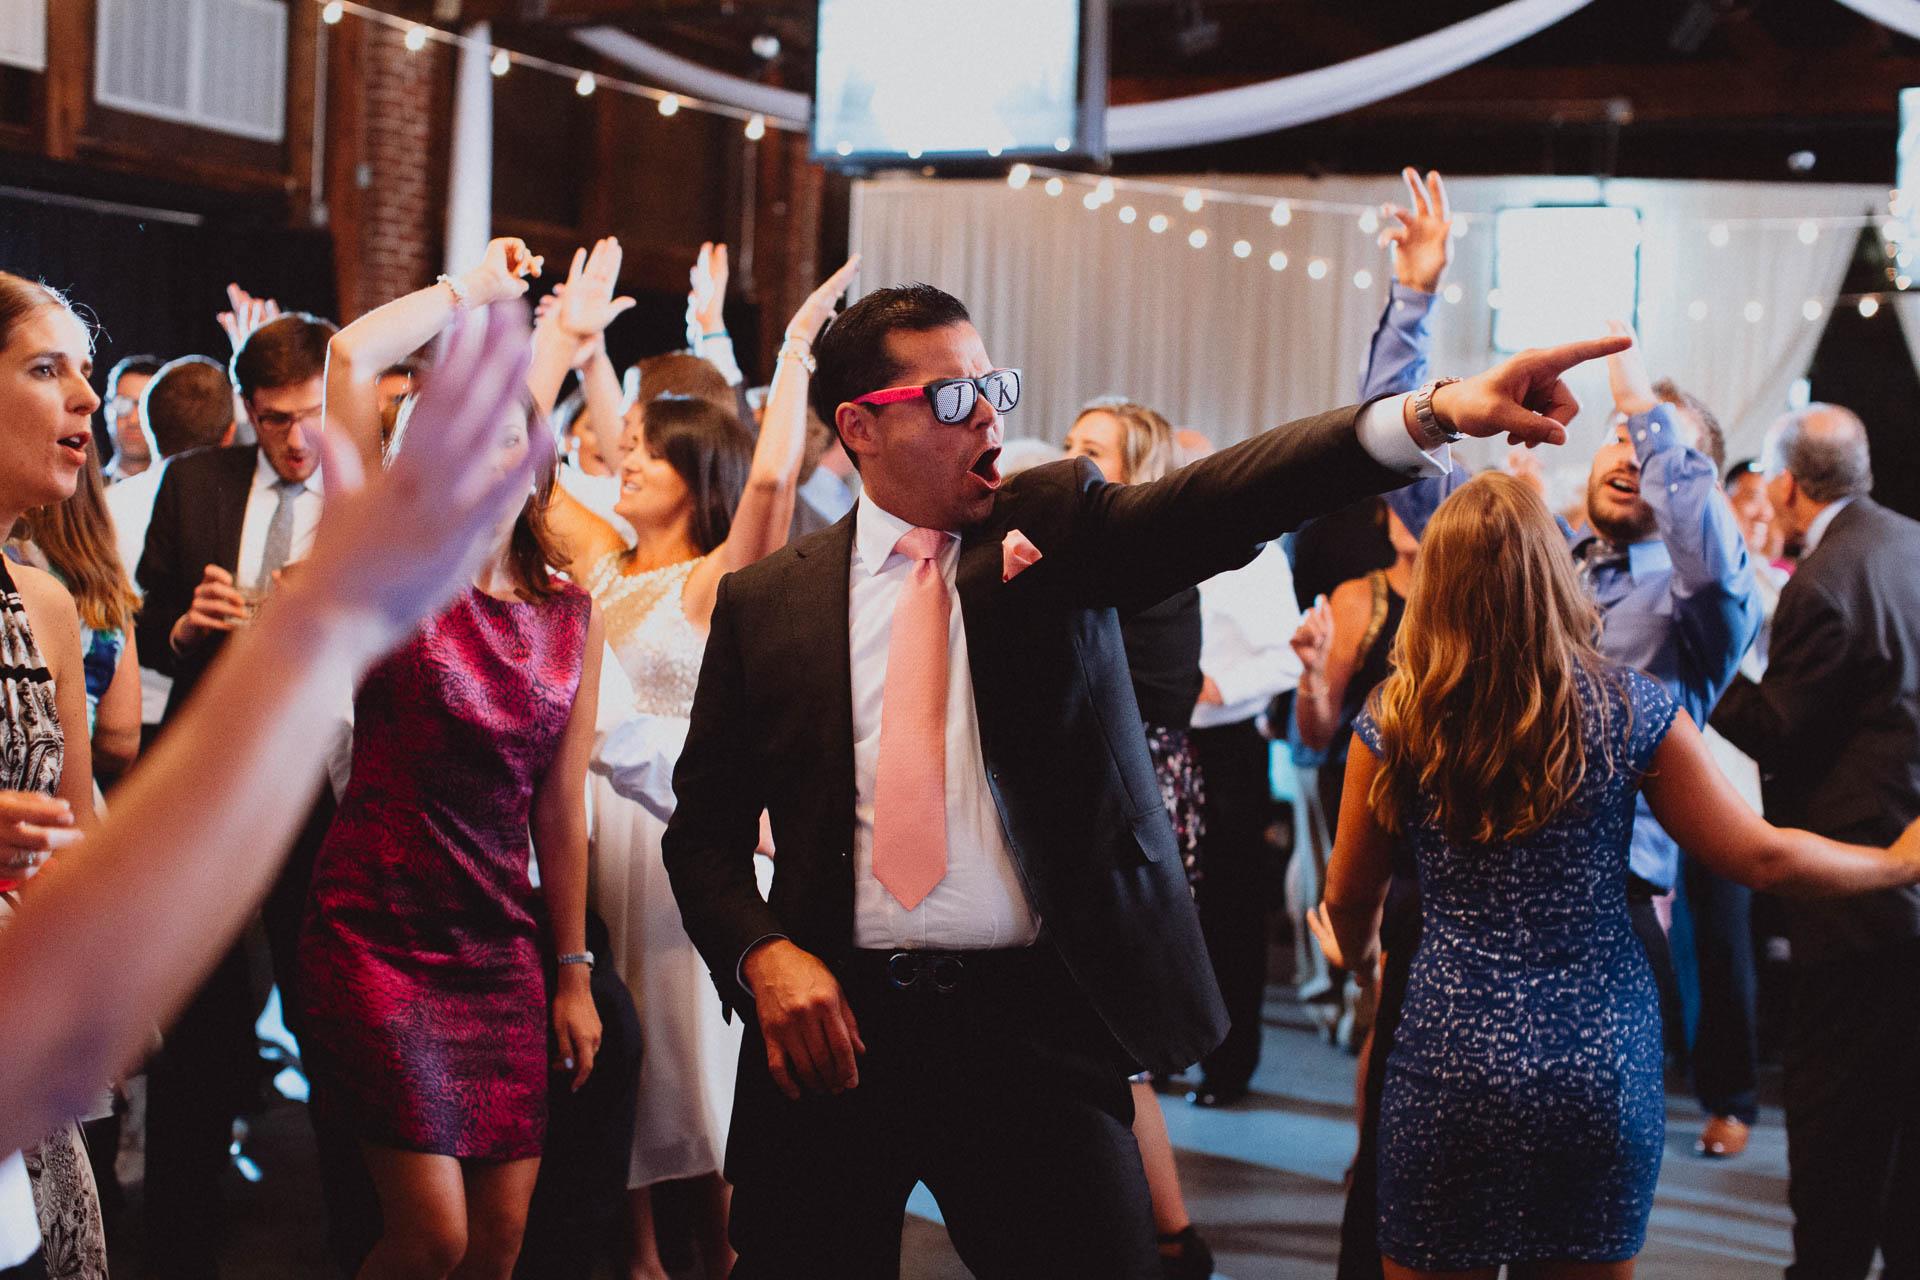 Keri-Joseph-Top-of-the-Market-Wedding-194@2x.jpg